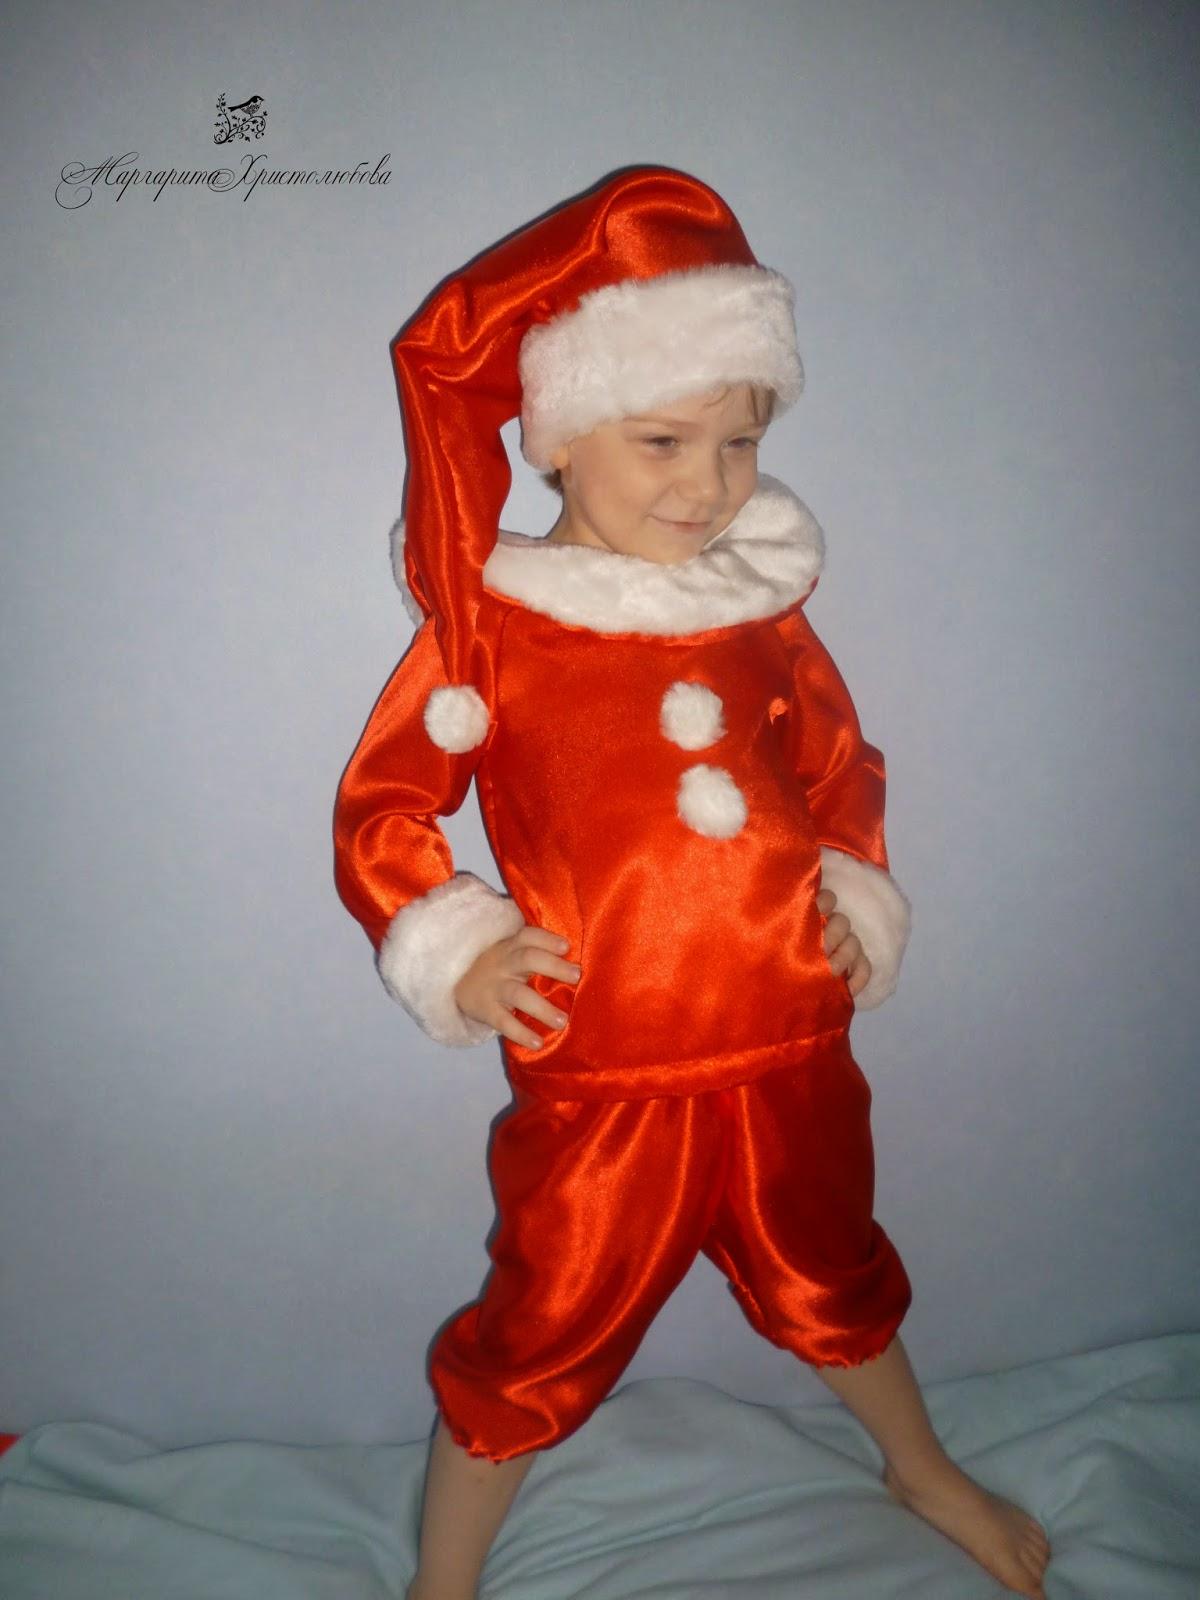 Шьём костюм гнома для мальчика своими руками 12